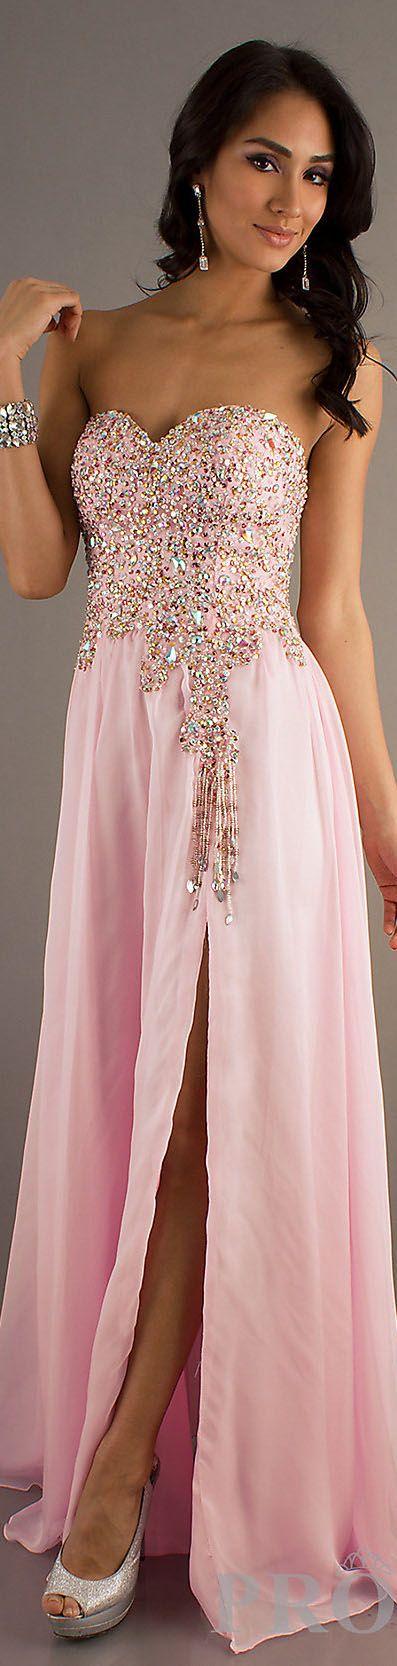 Fashion long formal dress #strapless #pink #sexy #glitter | vestidos ...